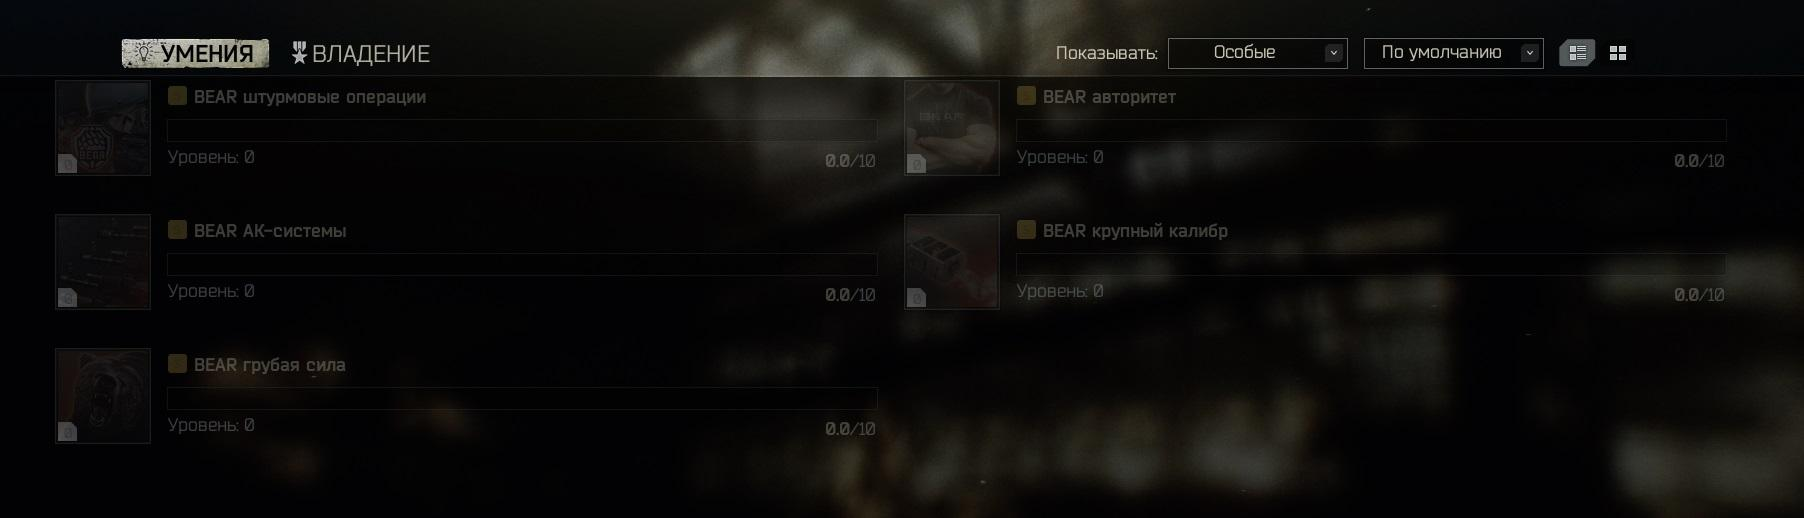 Escape from Tarkov навыки и умения BEAR